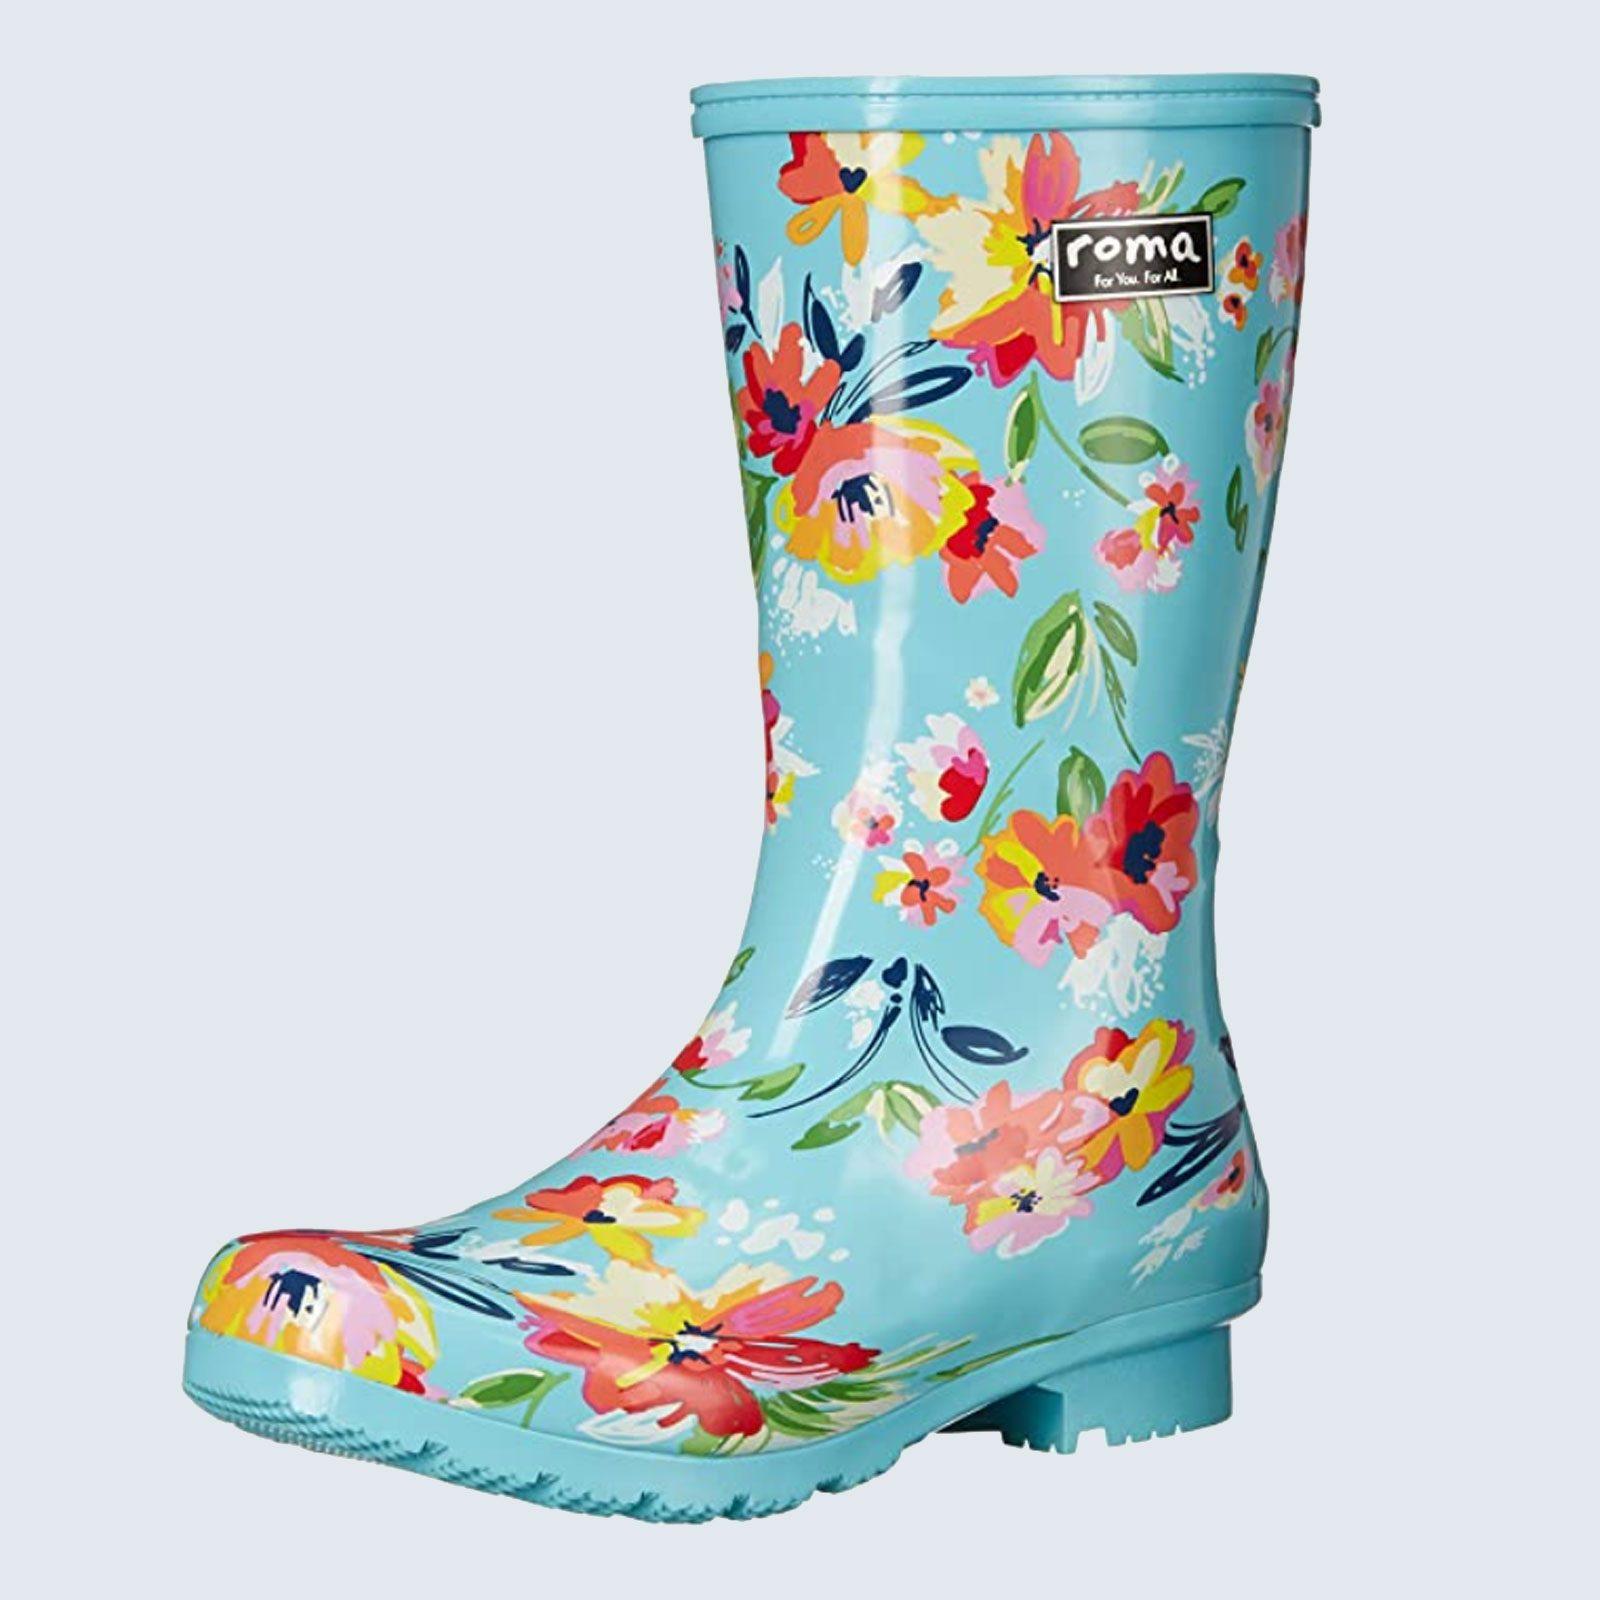 Roma Boots Emma Rain Boots